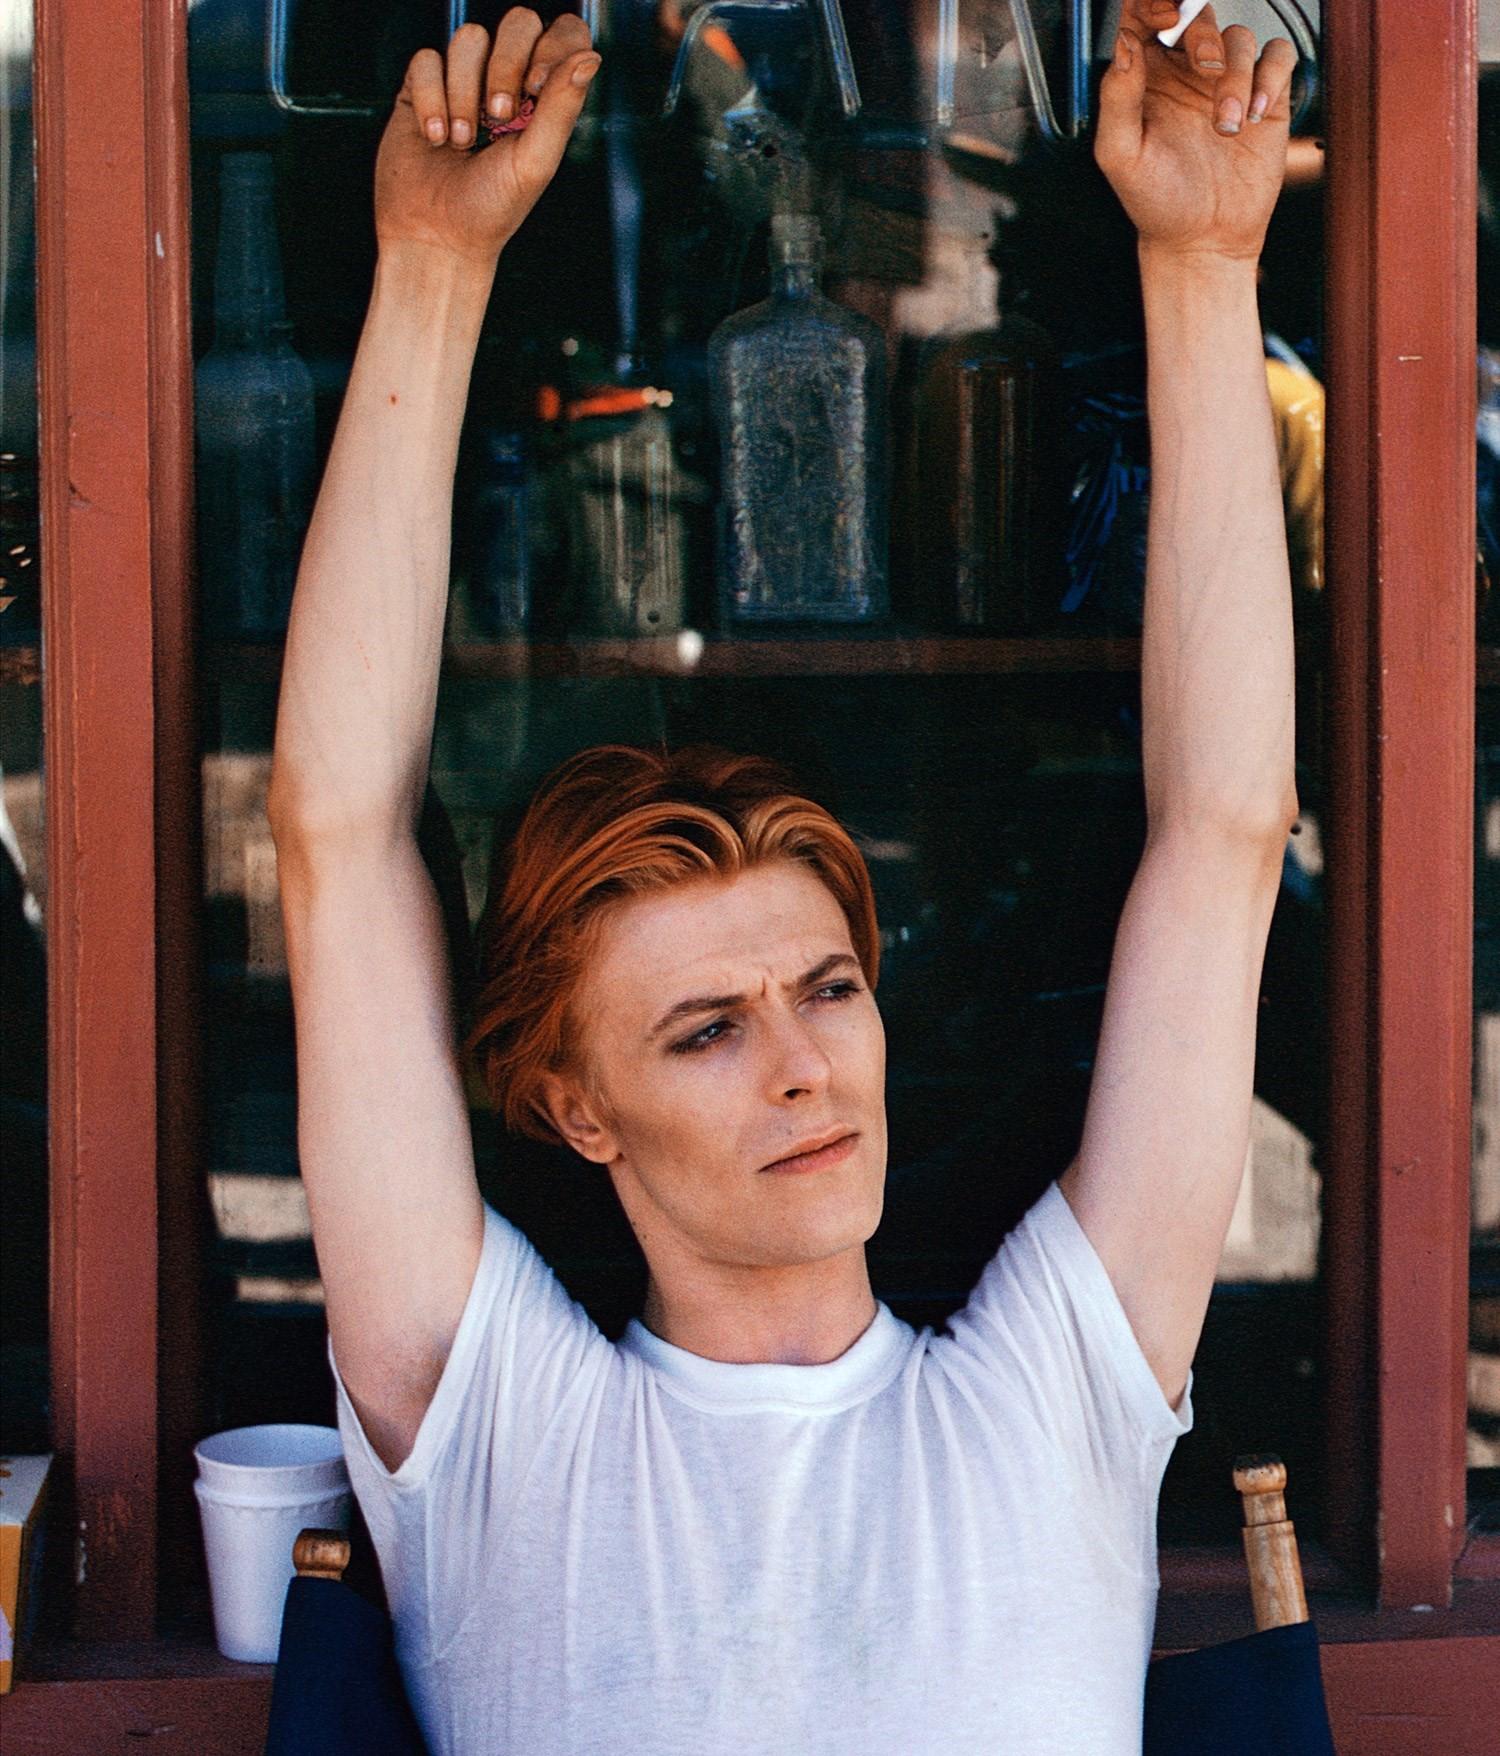 David Bowie: Fenton Lake, New Mexico, © Geoff MacCormack